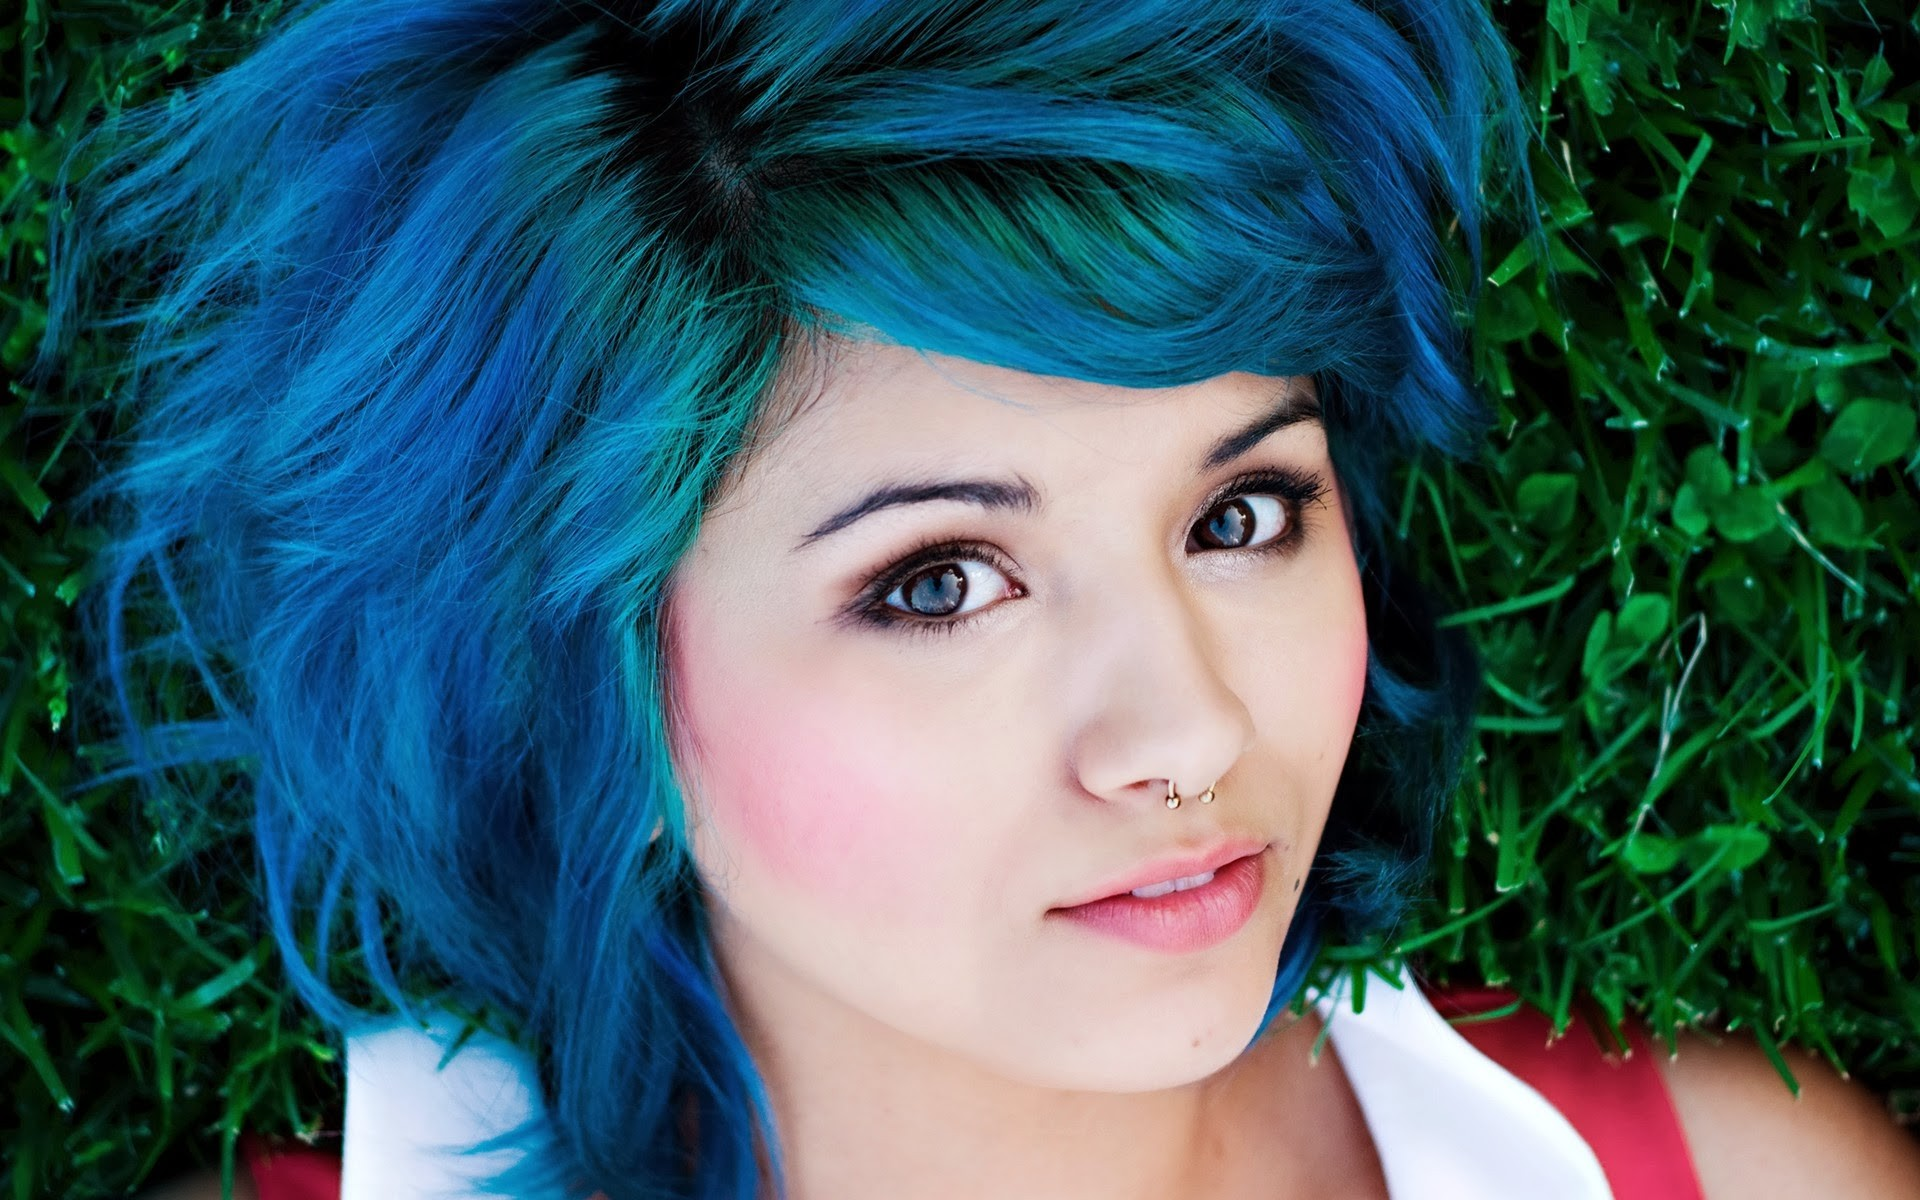 piercing, nose rings, Lia Curtis, girl, blue hair, face ...